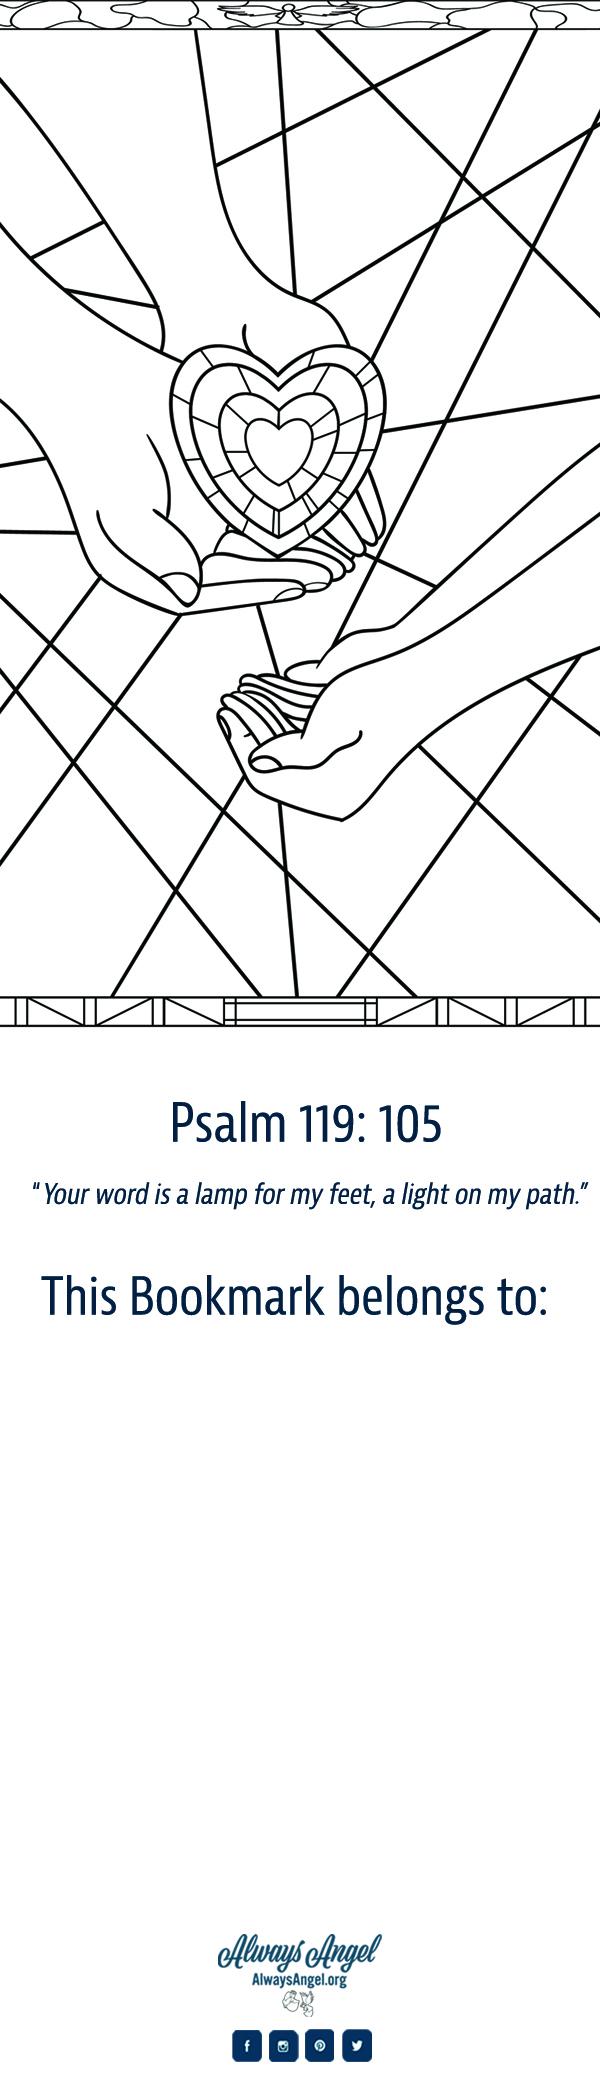 bookmark-heart-hands.jpg